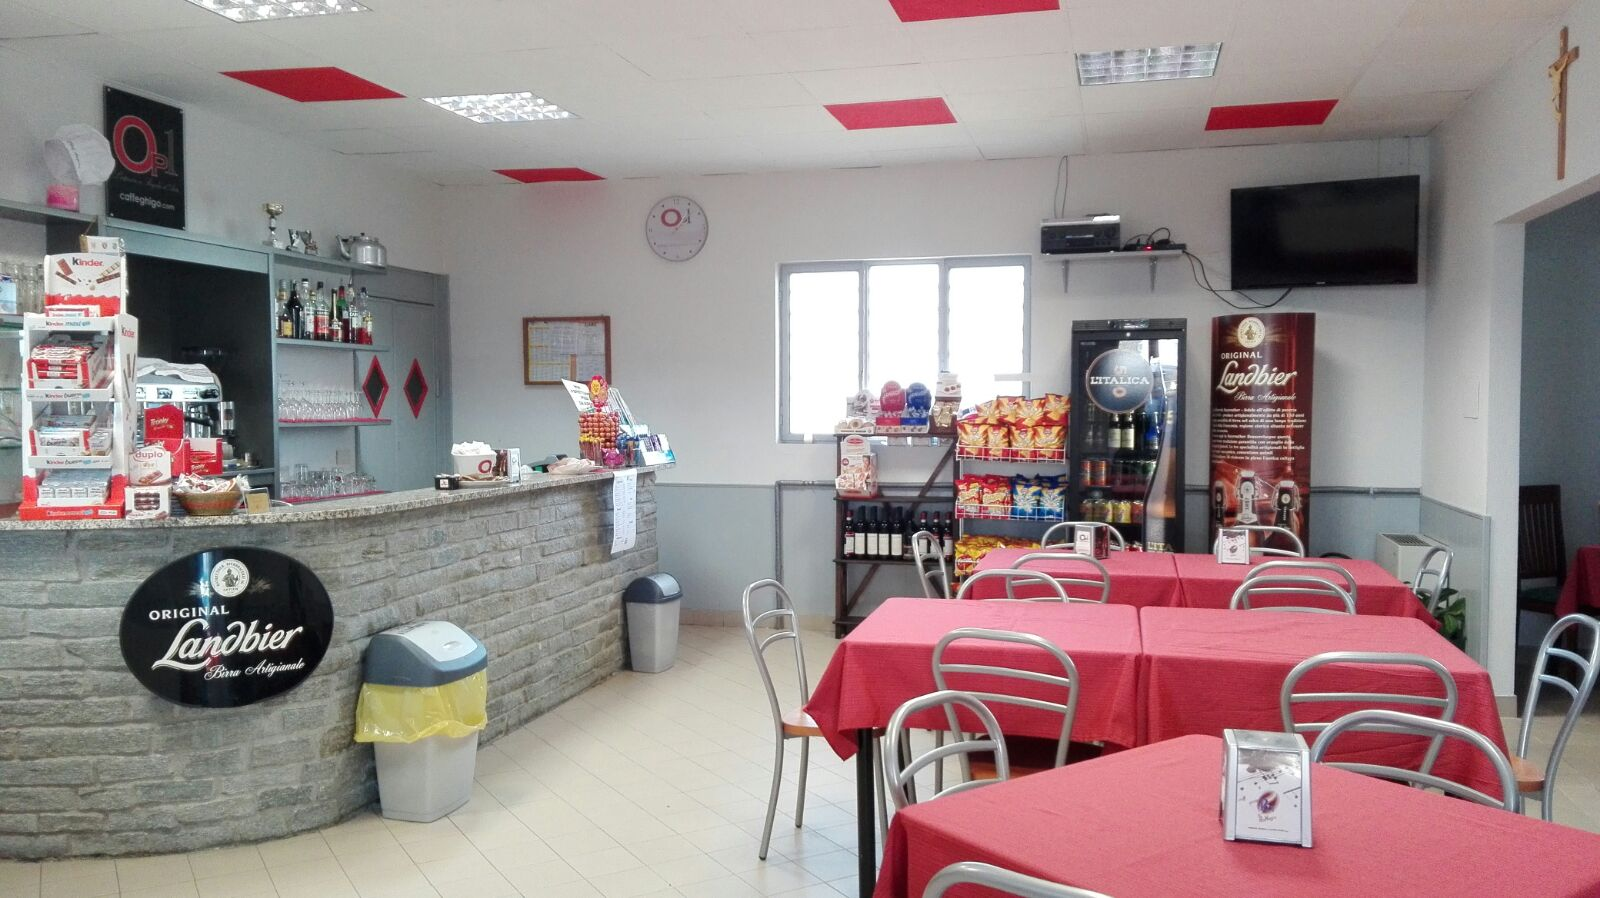 Bar - ristorante